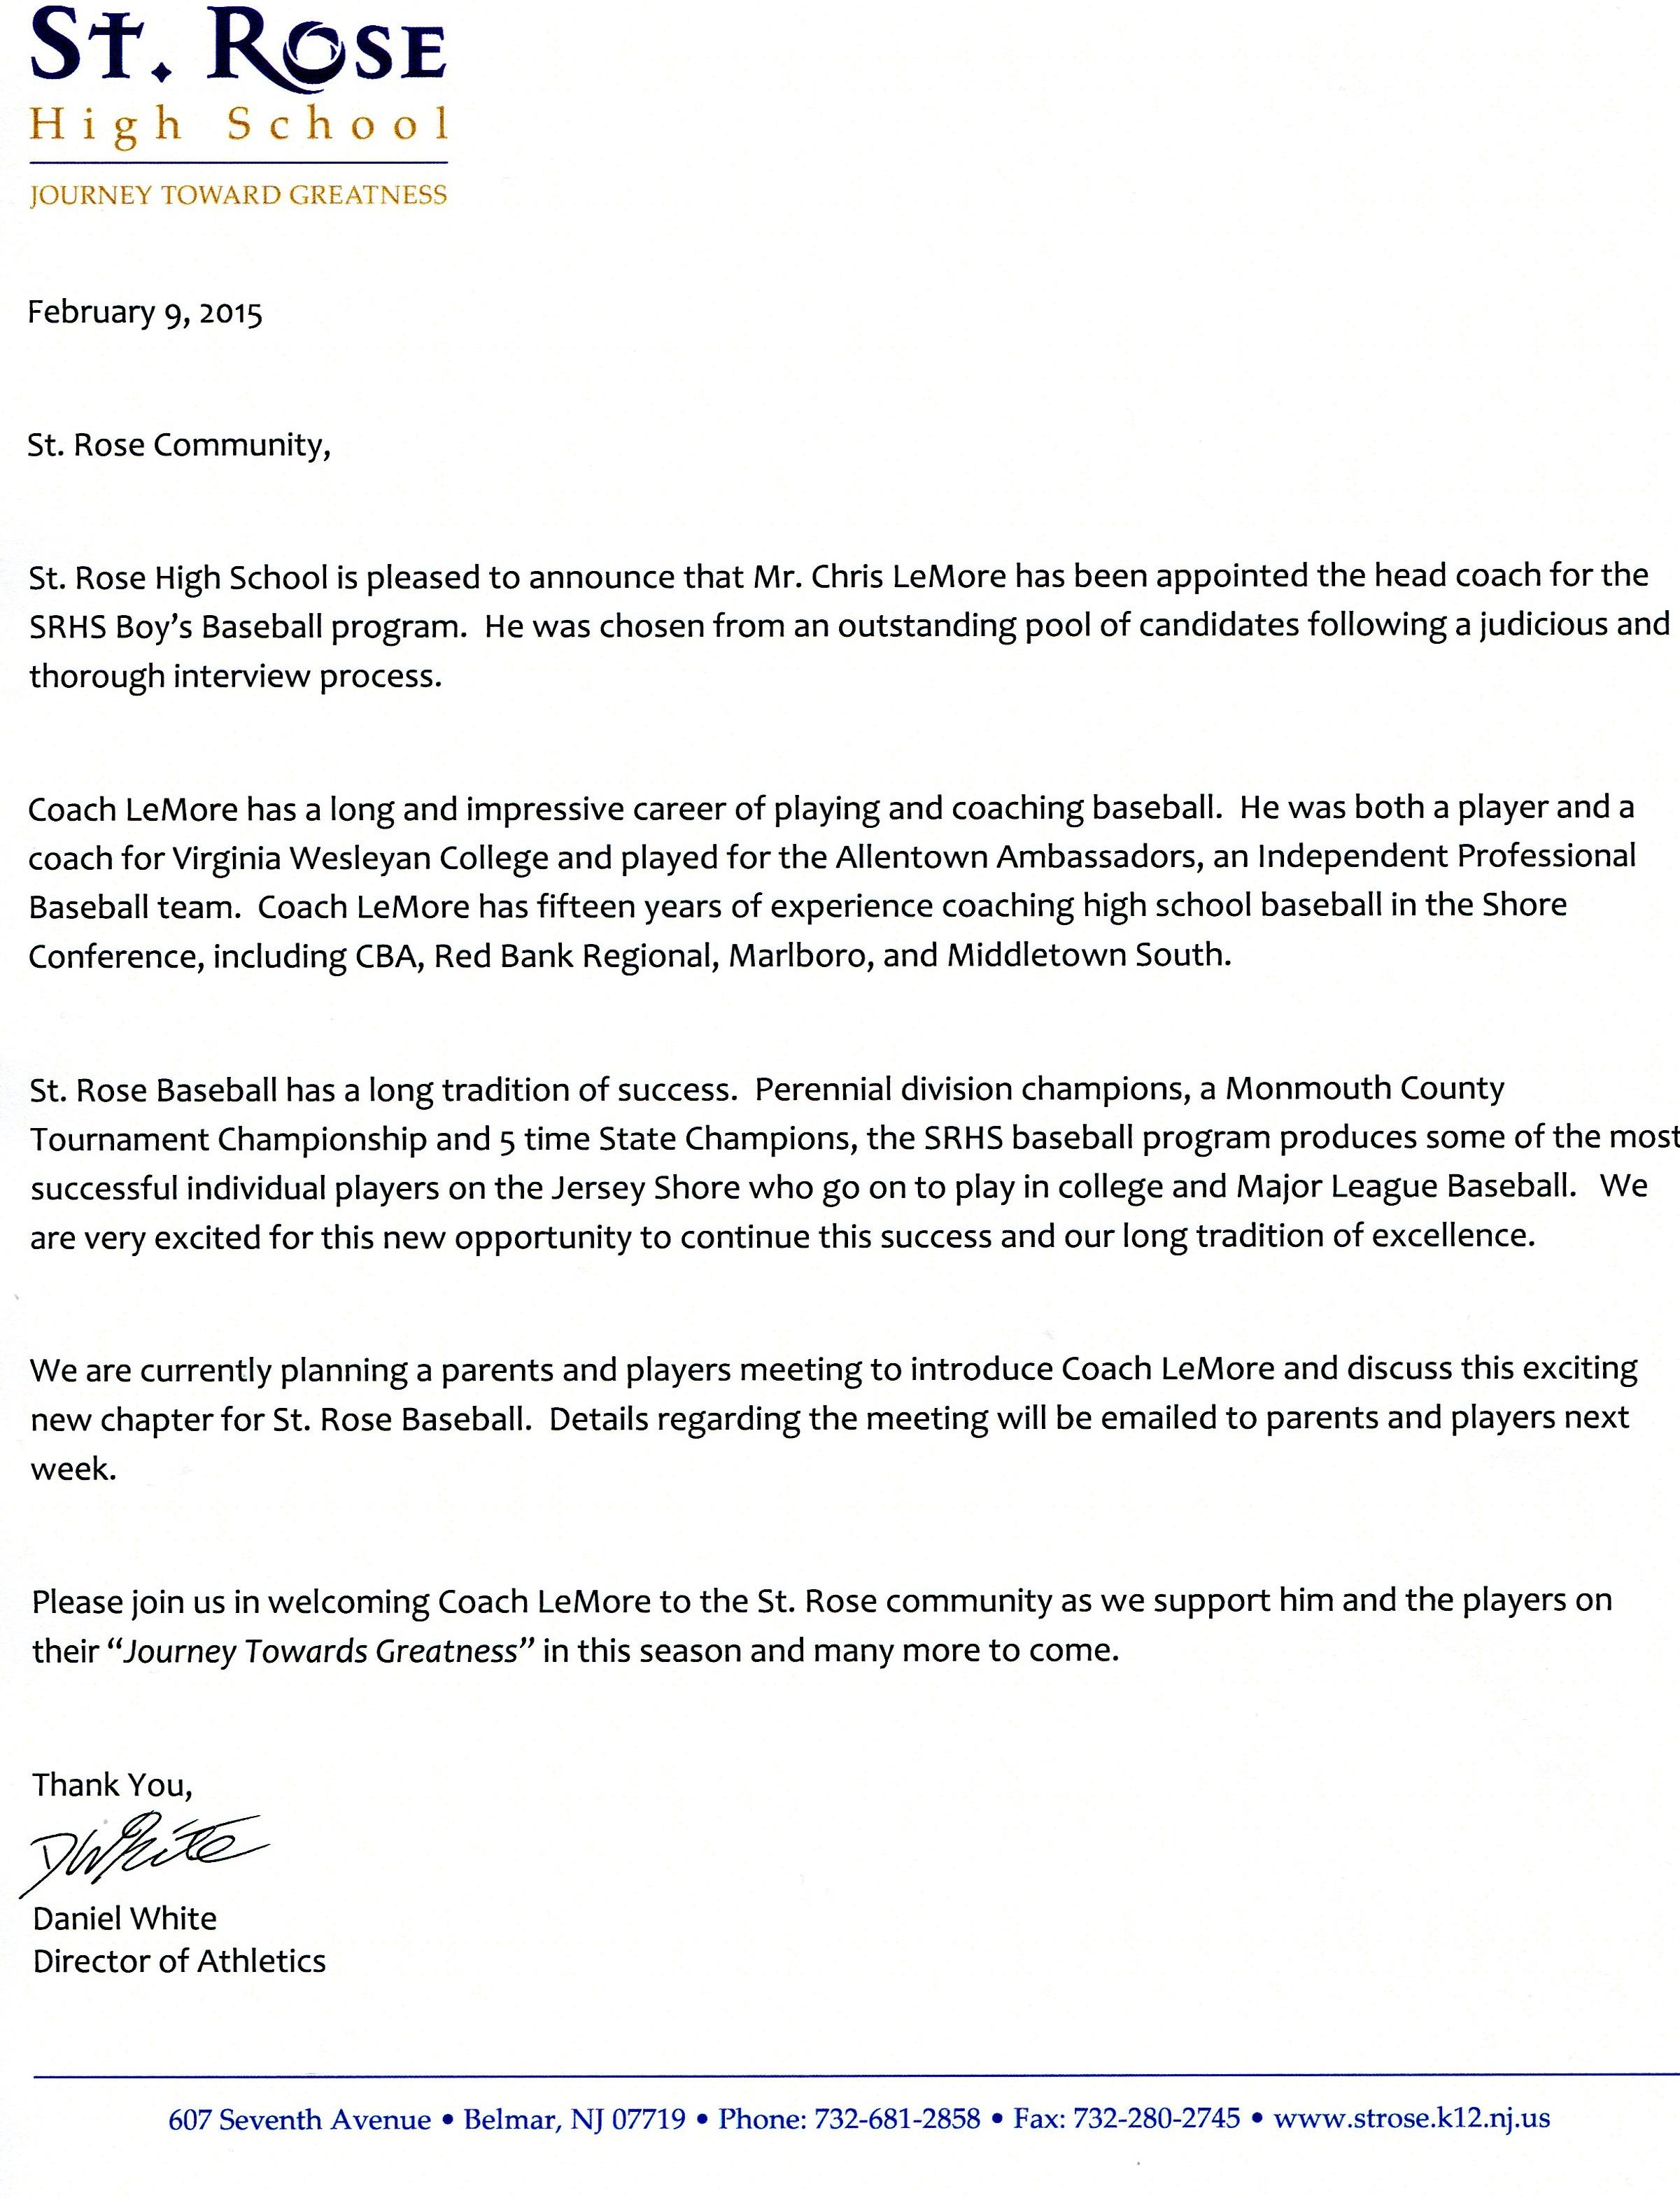 College essay written by a baseball player